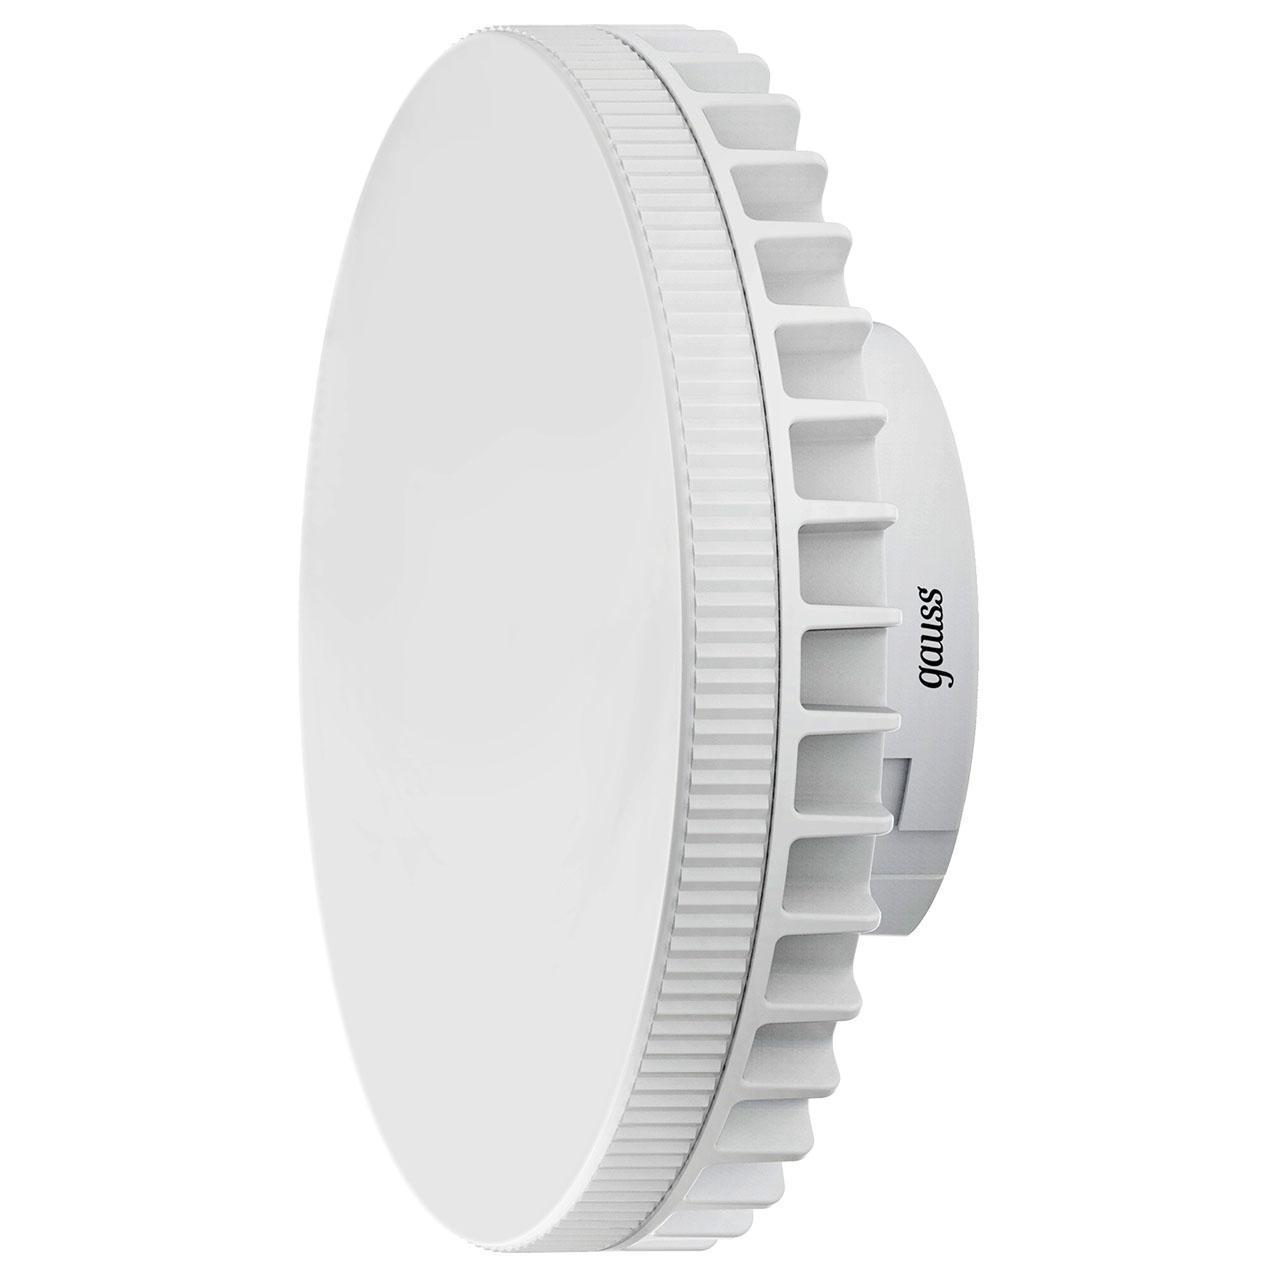 цена на Лампа светодиодная GX70 12W 2700K матовая 131016112